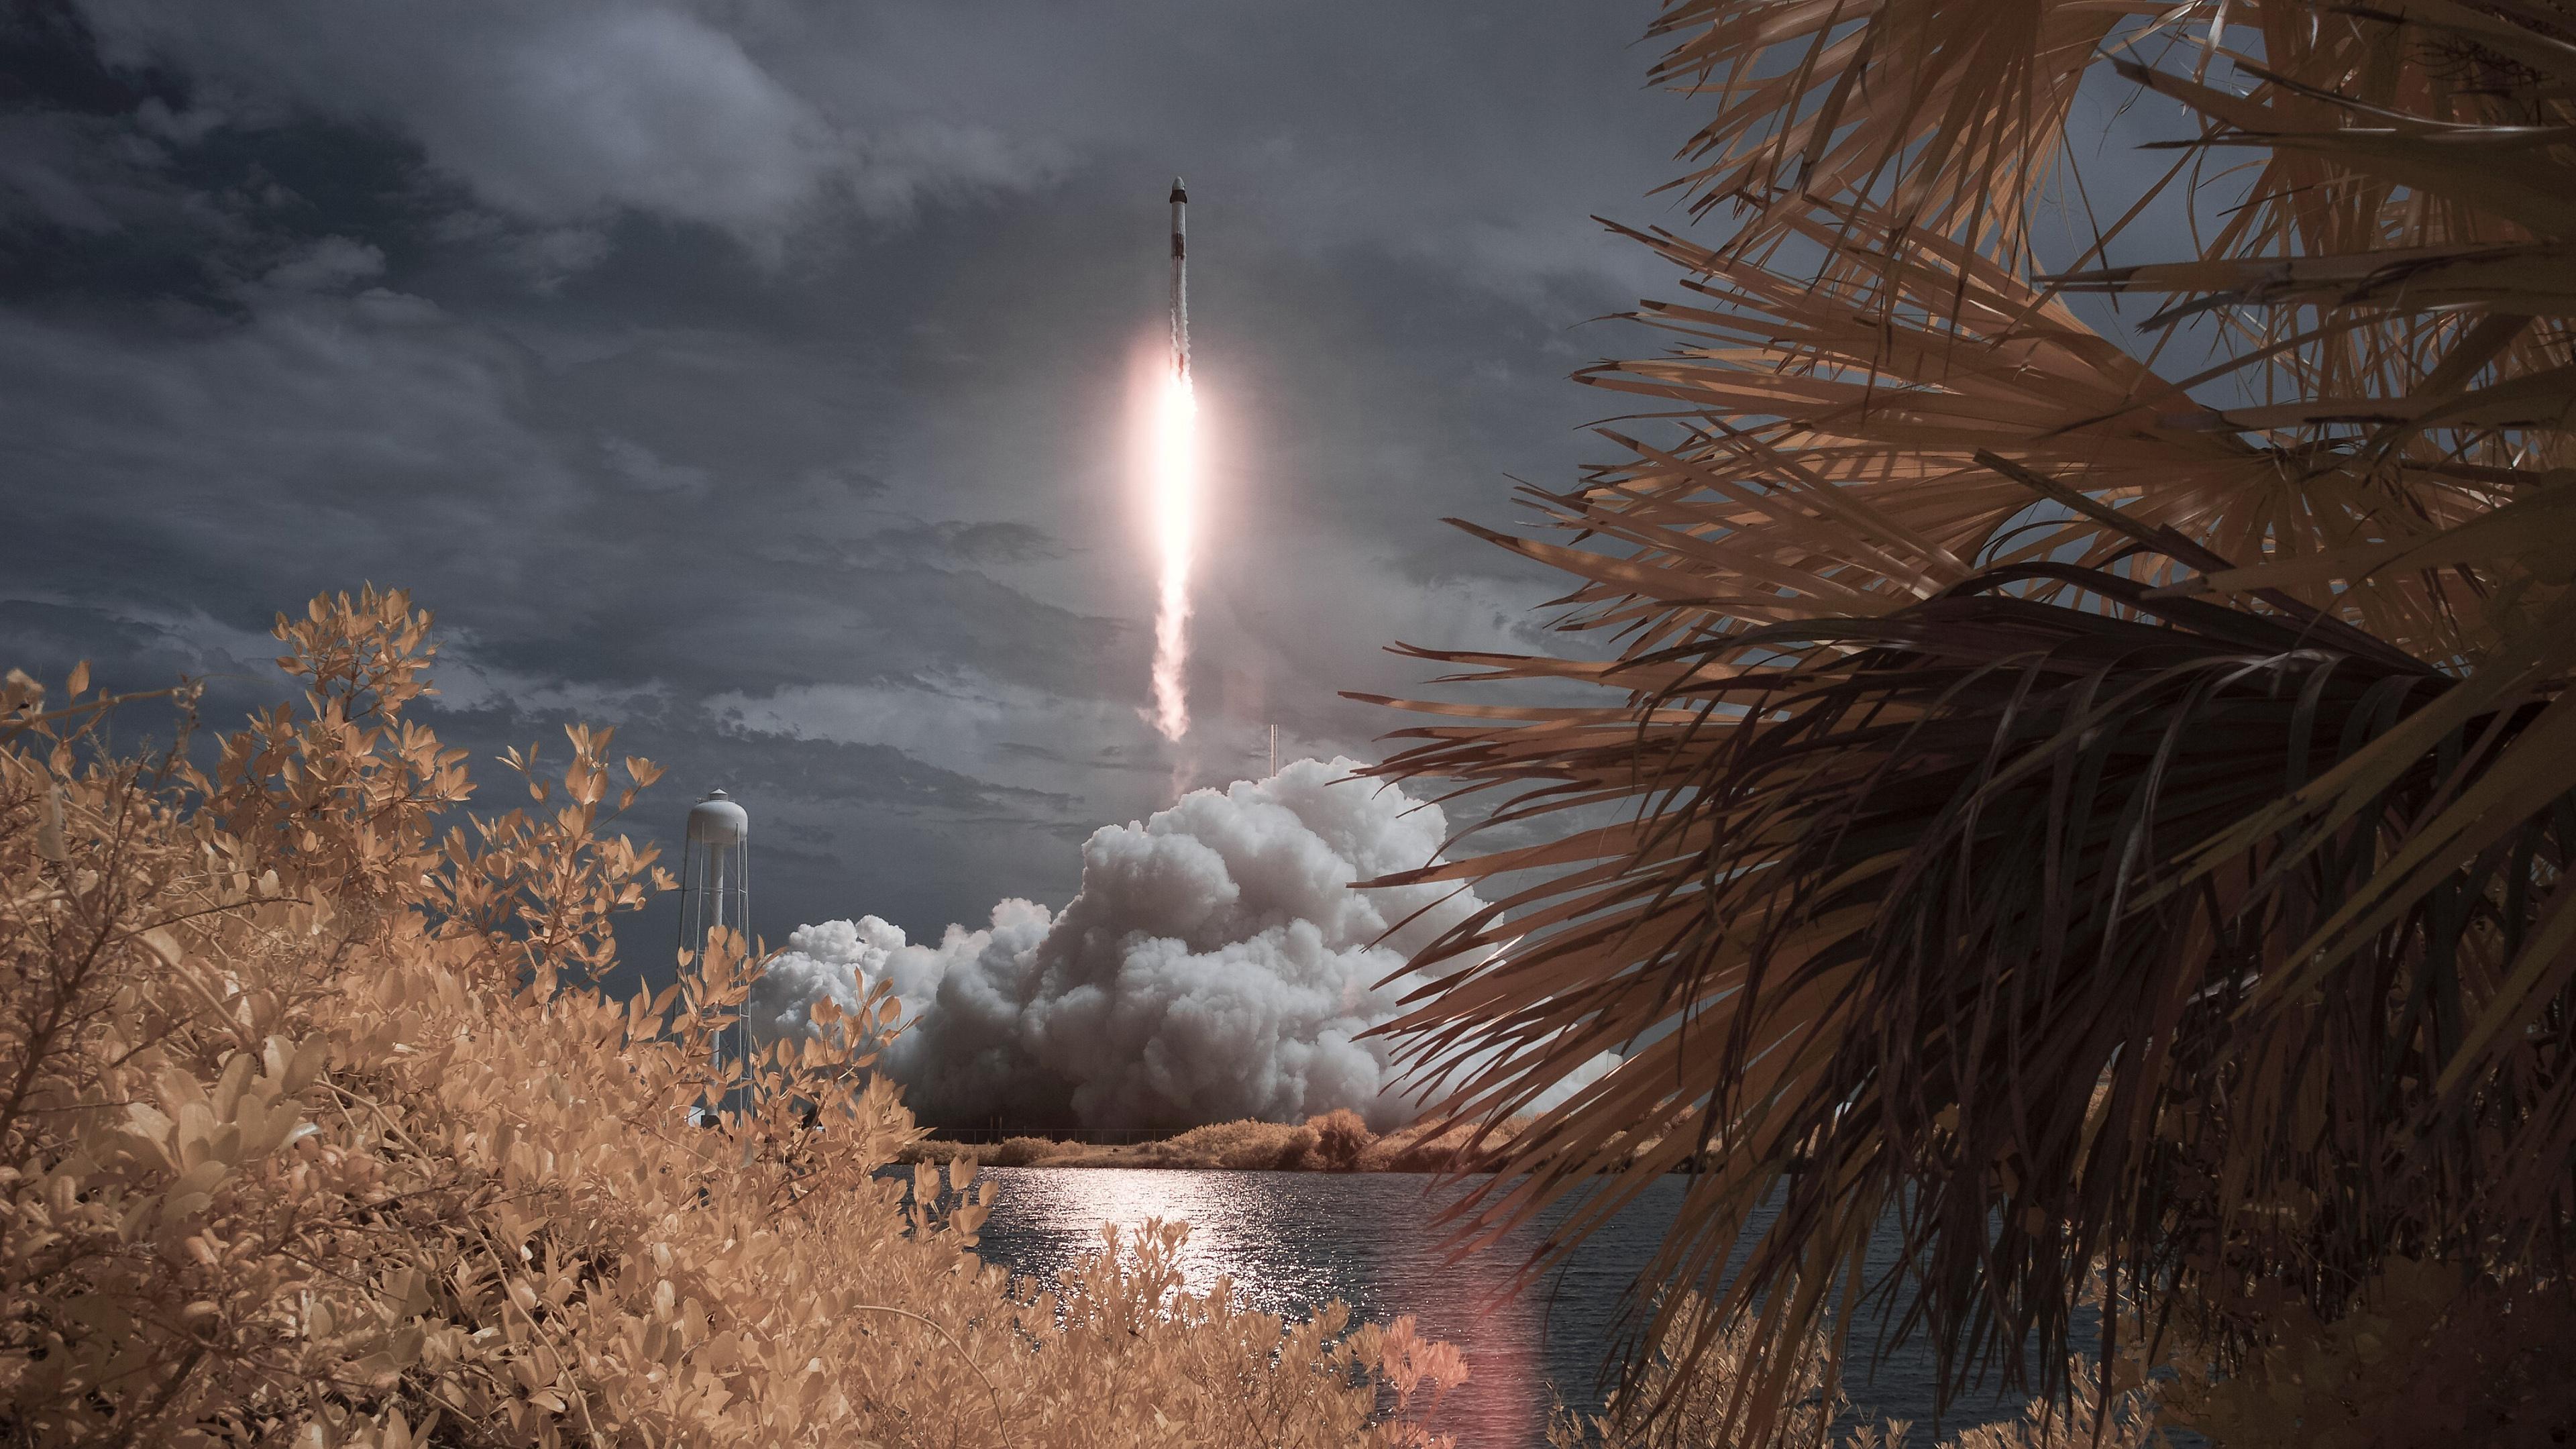 SpaceX Falcon 9 Rocket Crew Dragon Liftoff 4k Ultra HD Wallpaper 3840x2160